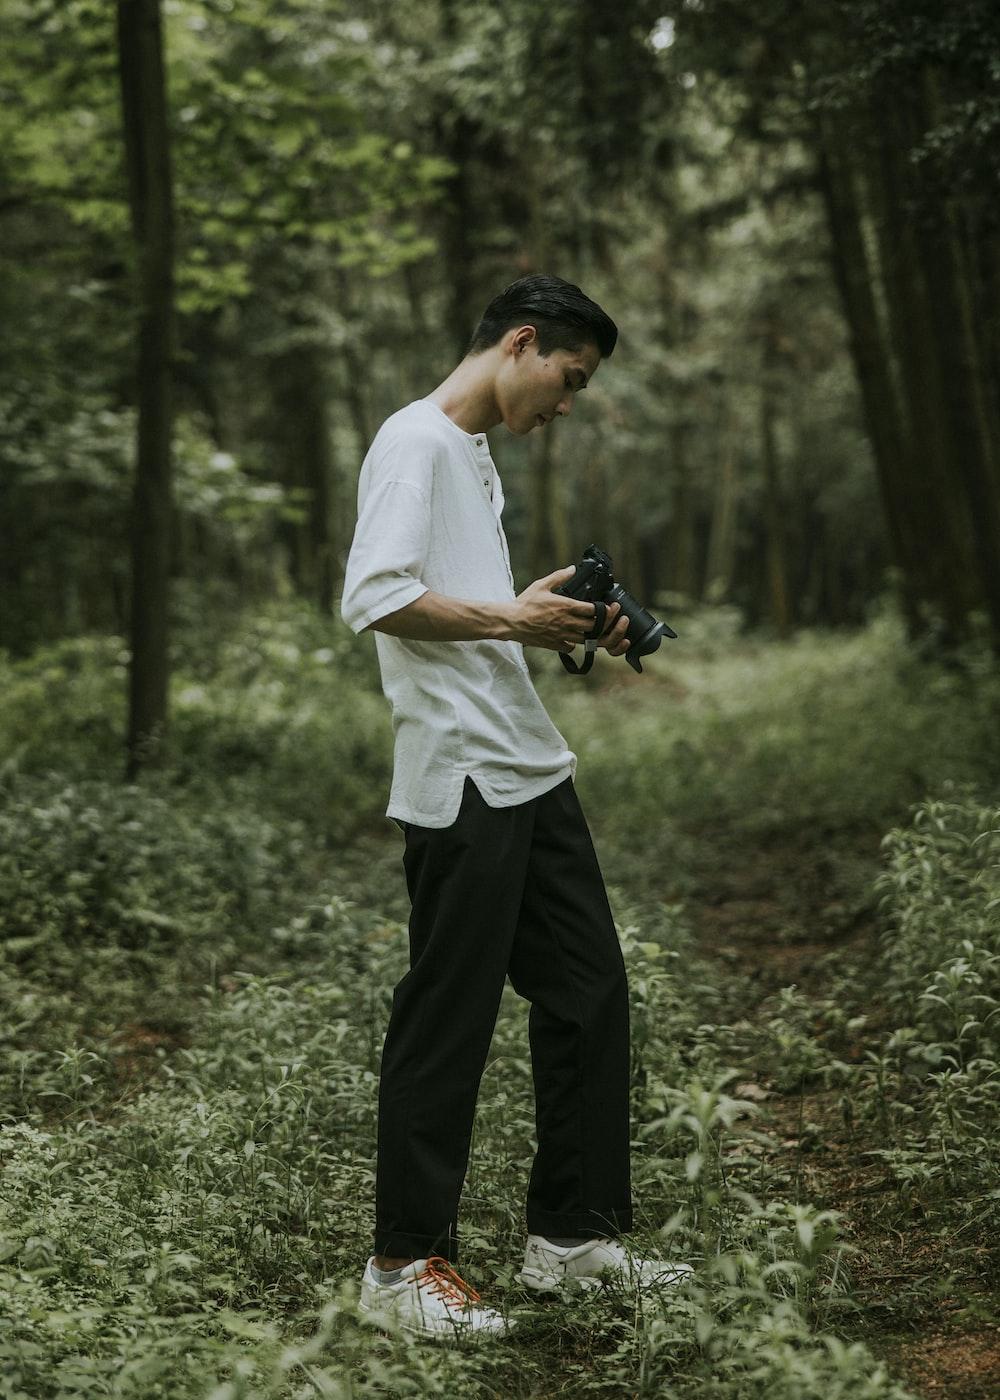 man standing black DSLR camera